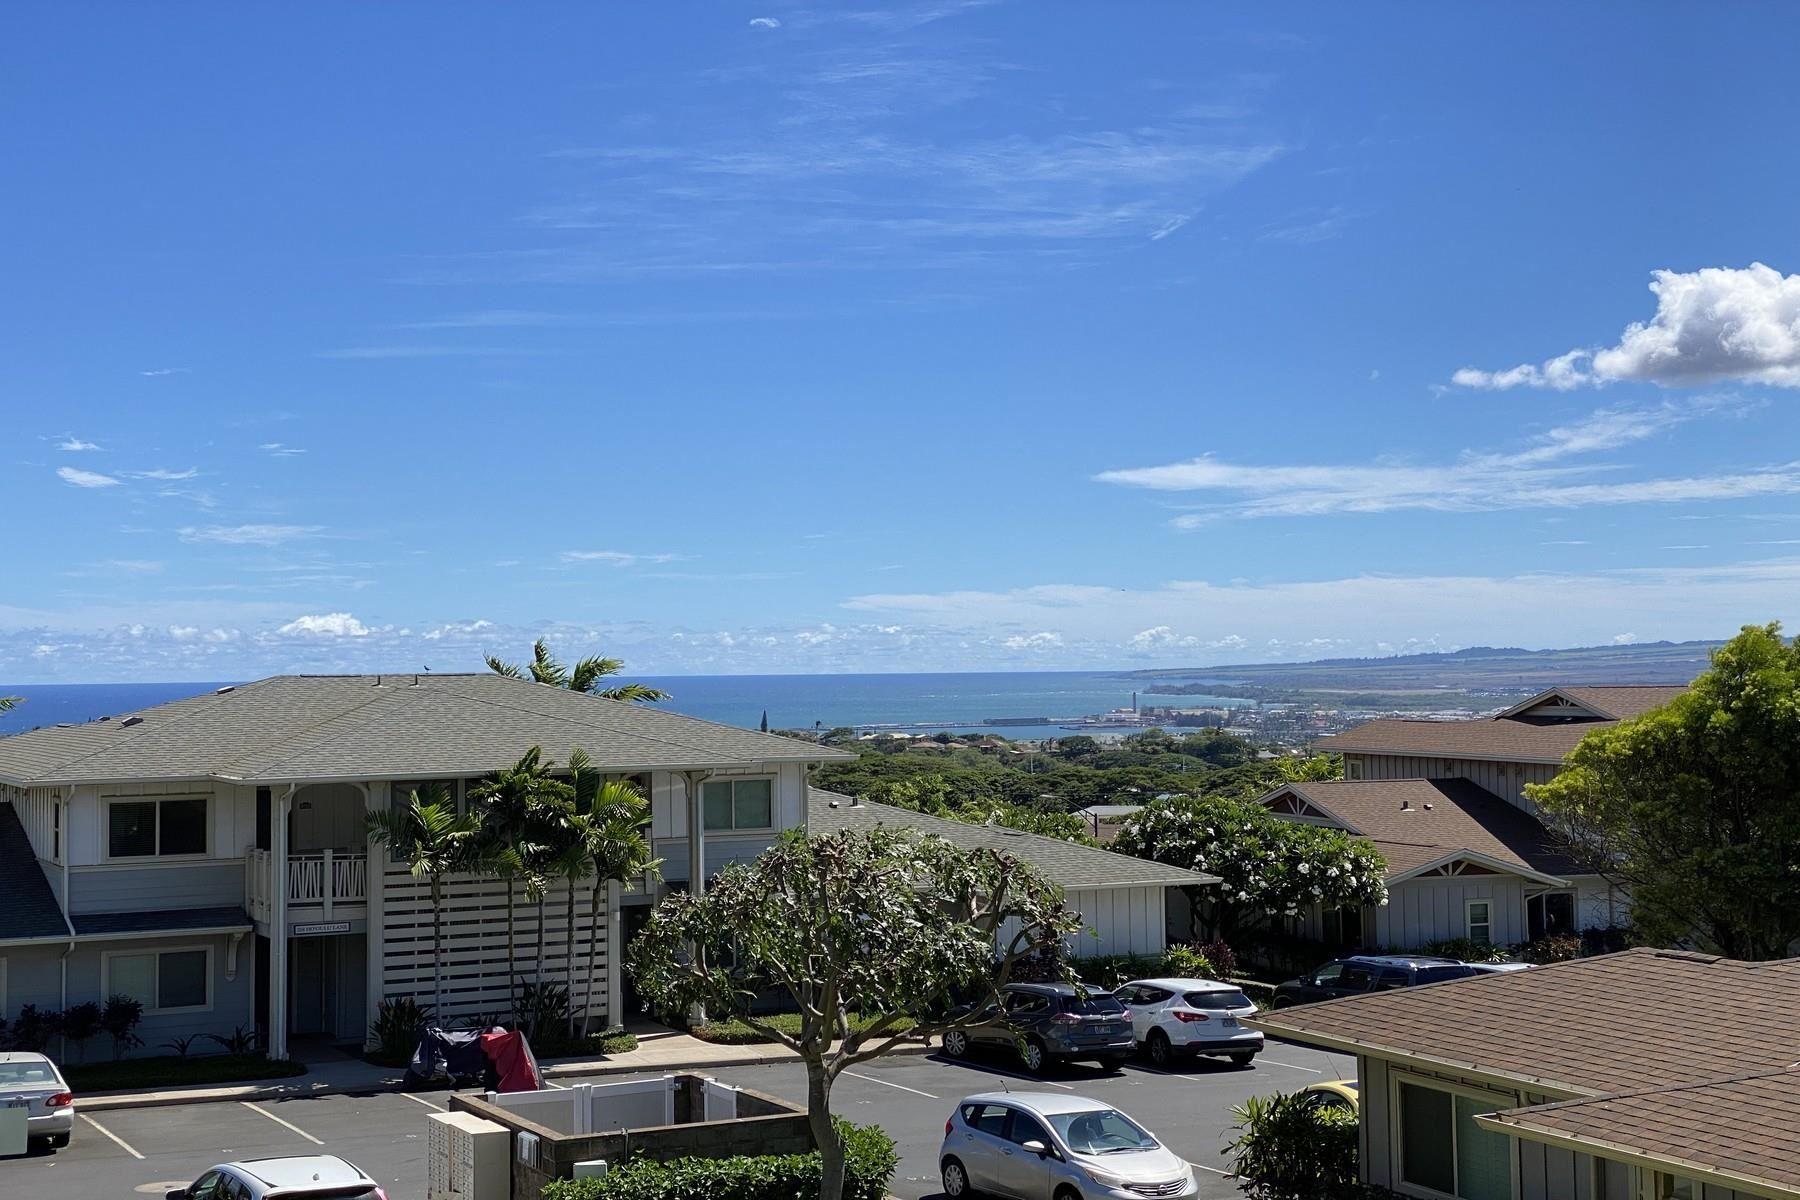 Photo of 136 Hoowaiwai Loop #1402, Wailuku, HI 96793-4130 (MLS # 392850)